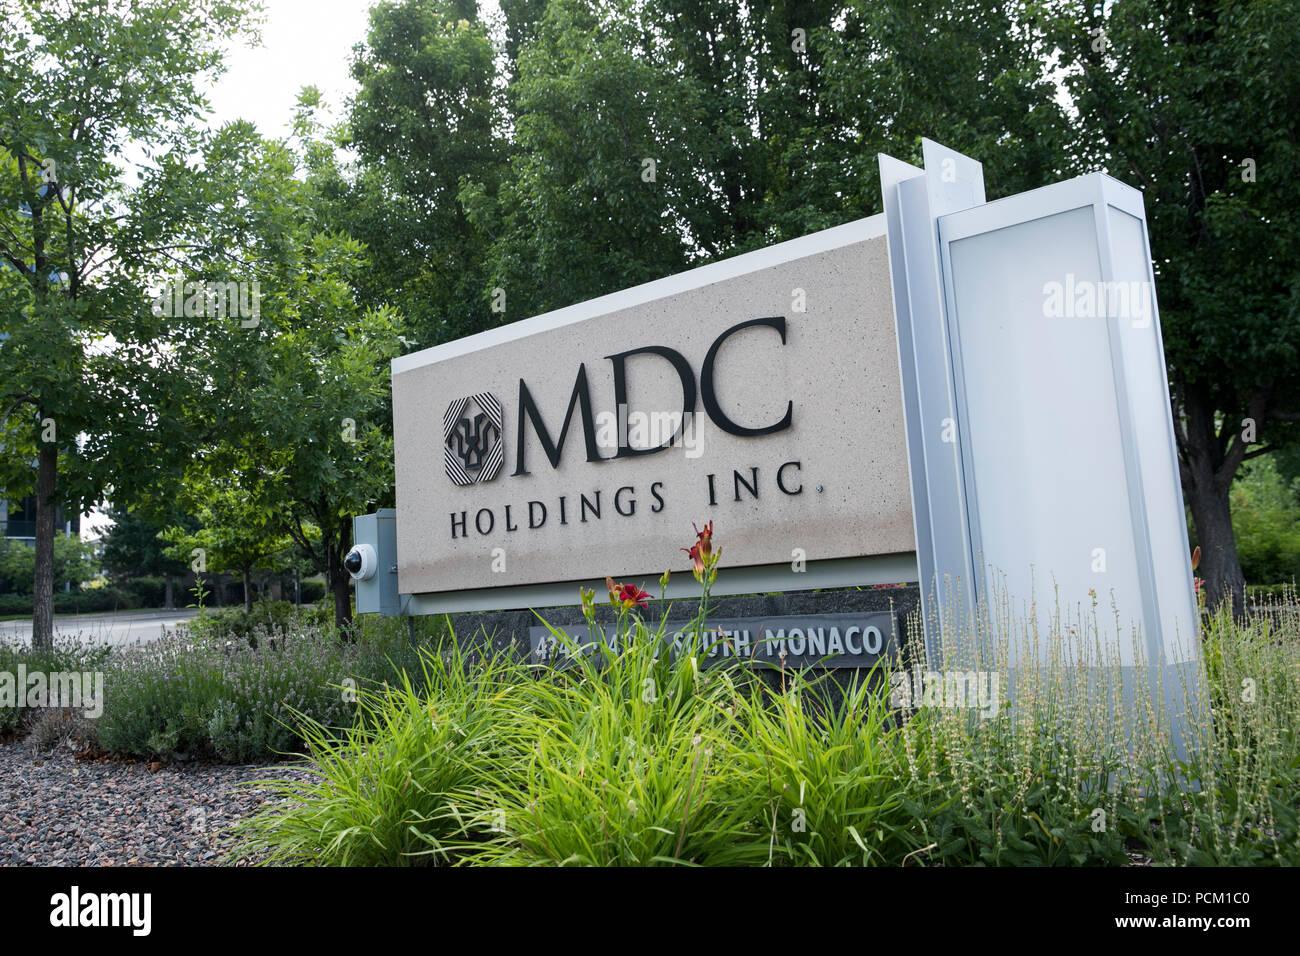 Mdc Stock Photos & Mdc Stock Images - Alamy